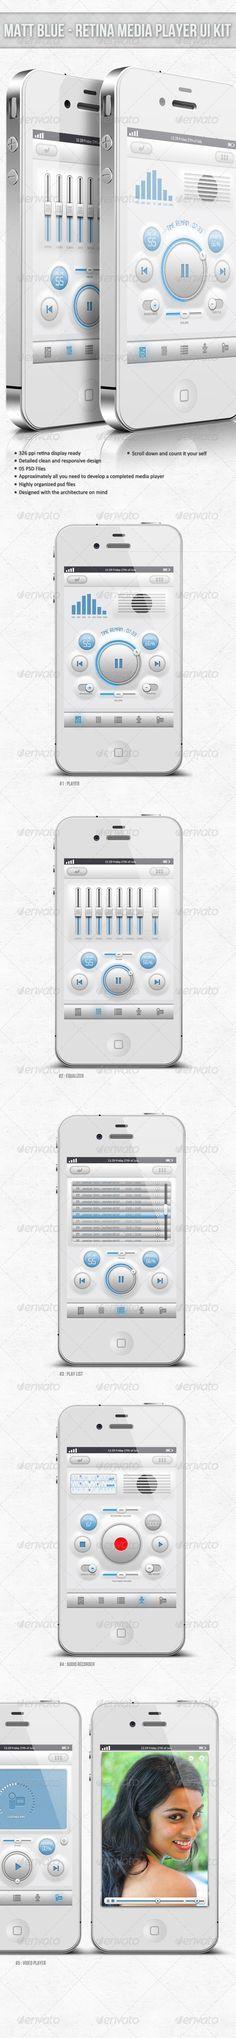 Matt Blue - Retina Audio Player UI